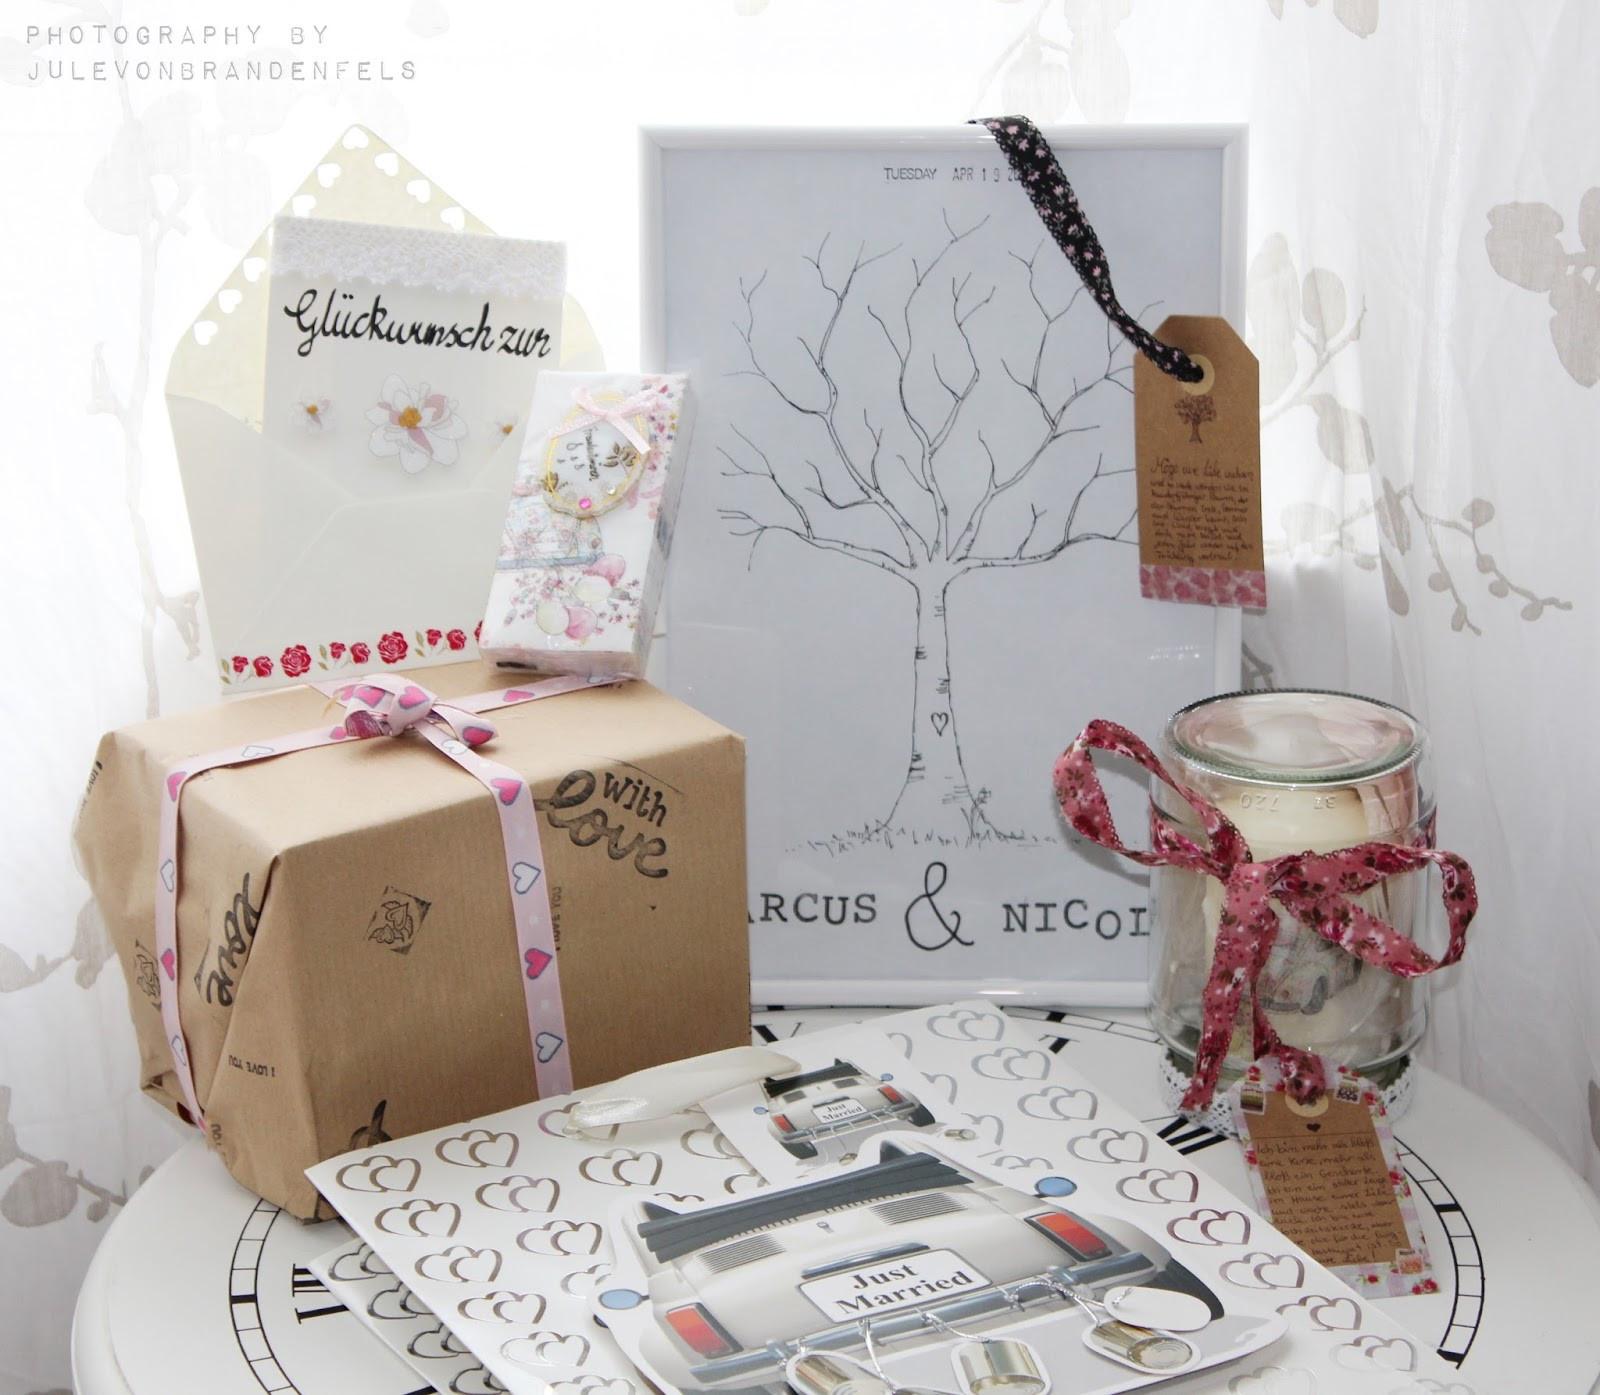 Diy Hochzeitsgeschenke  Julchen s Lieblingsecke DIY Hochzeitsgeschenke